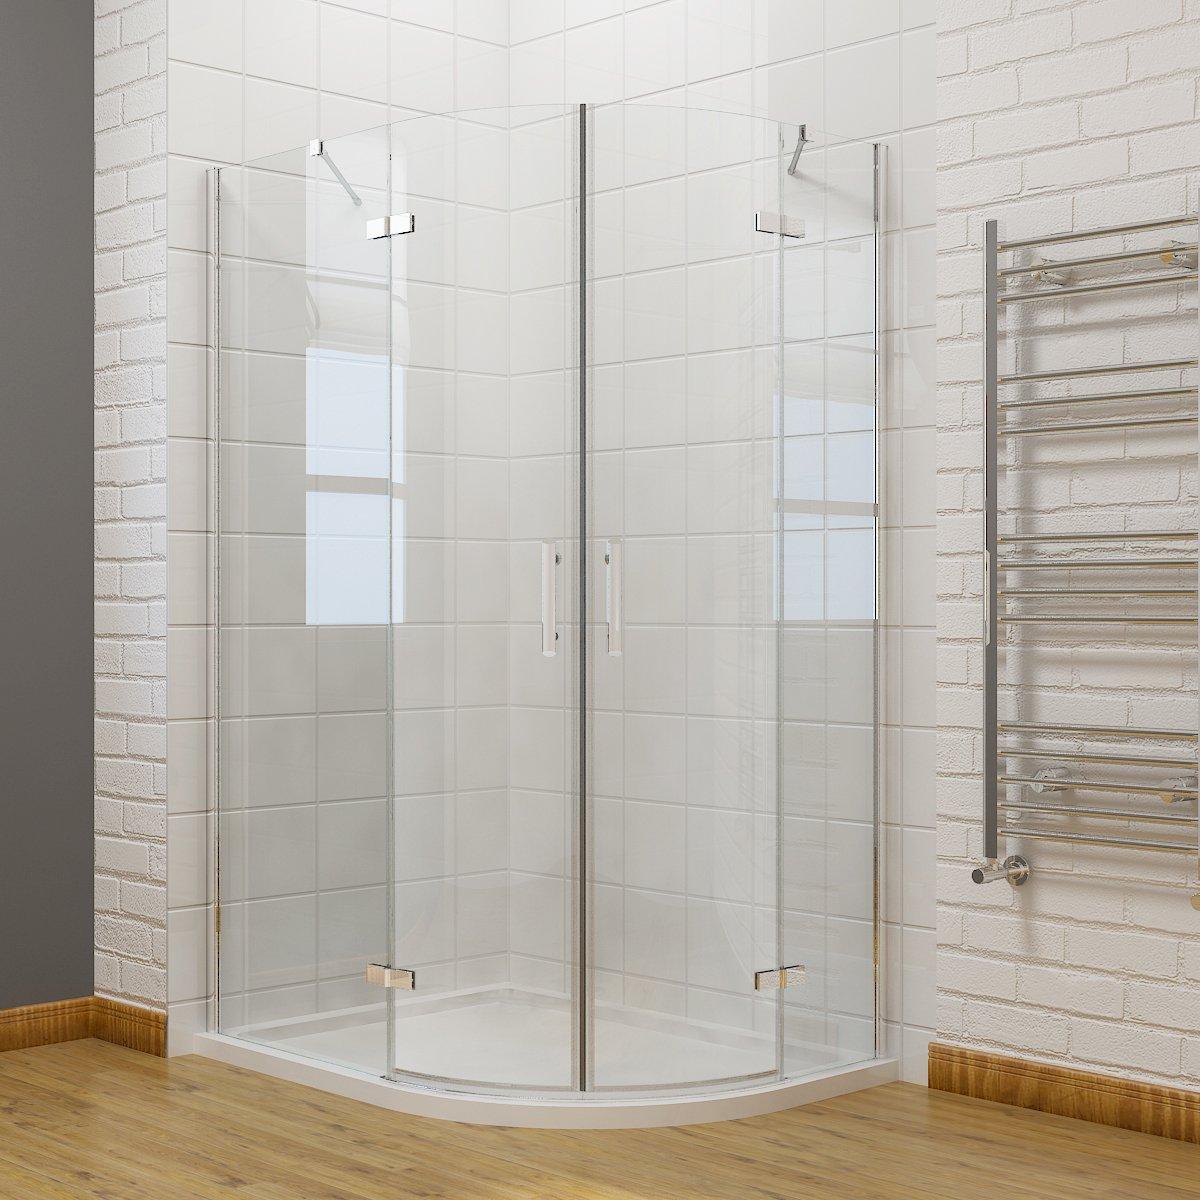 800 x 800mm Quadrant Shower Enclosure Pivot Hinge 6mm Glass Shower Cubicle Door ELEGANT